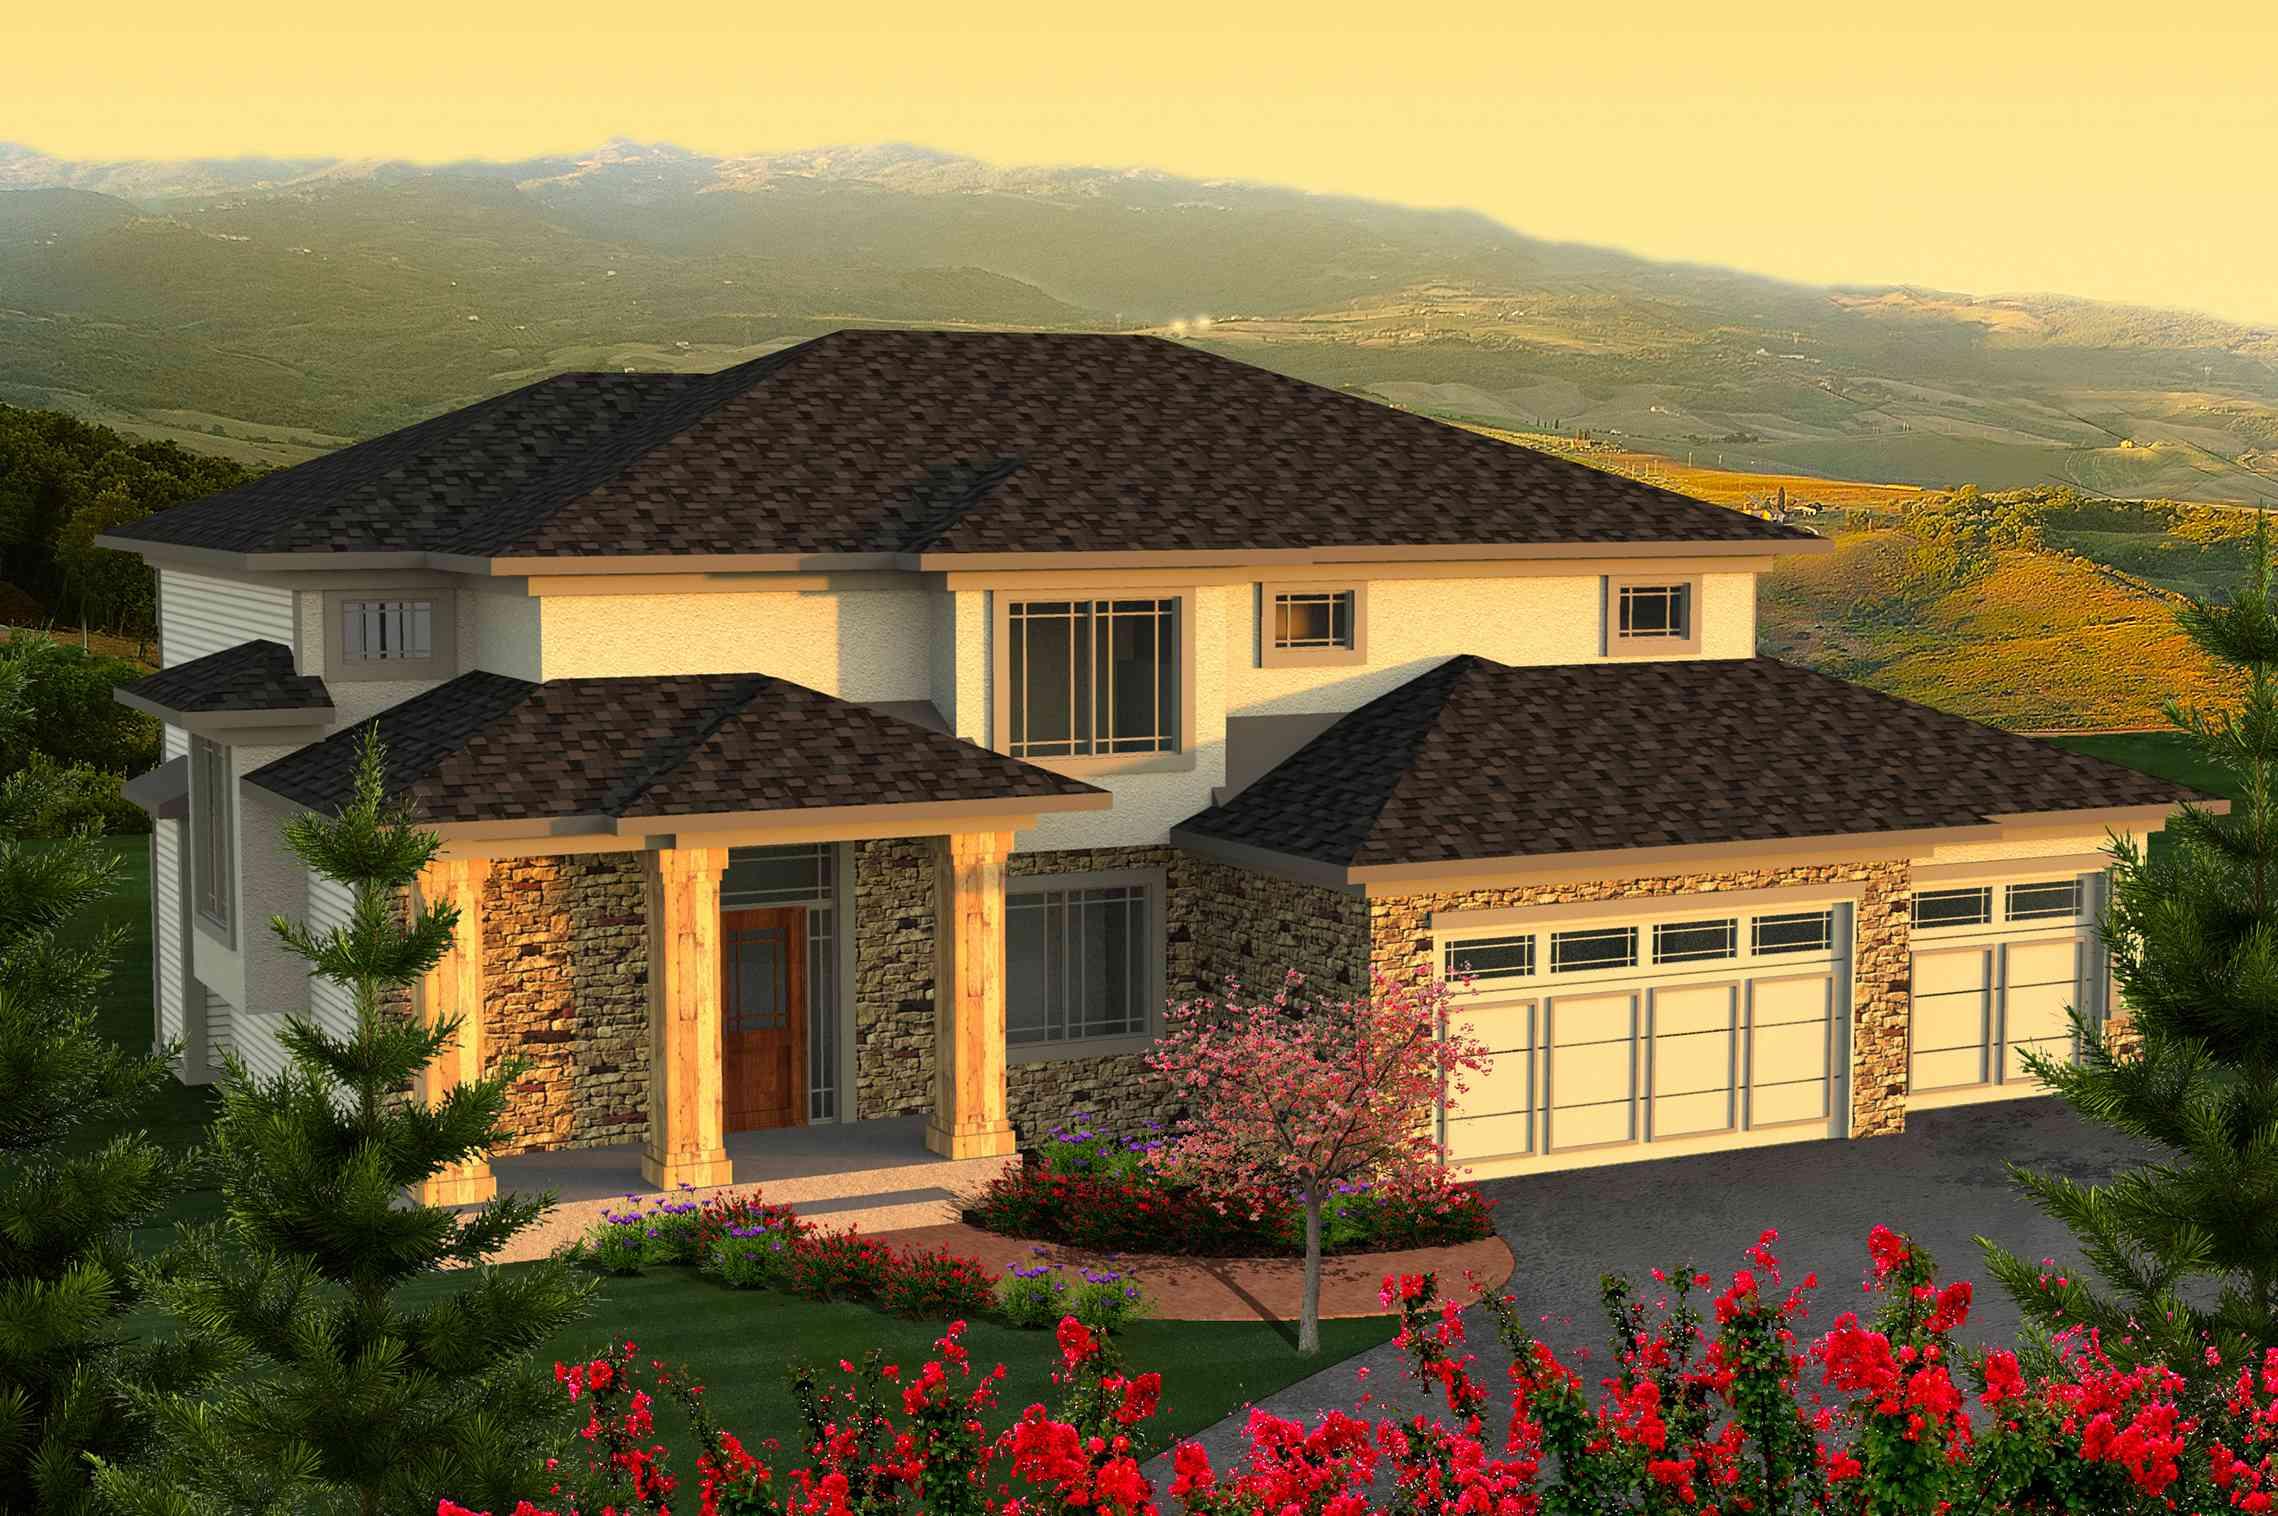 2-Story Prairie House Plan - 89924AH | Architectural ...